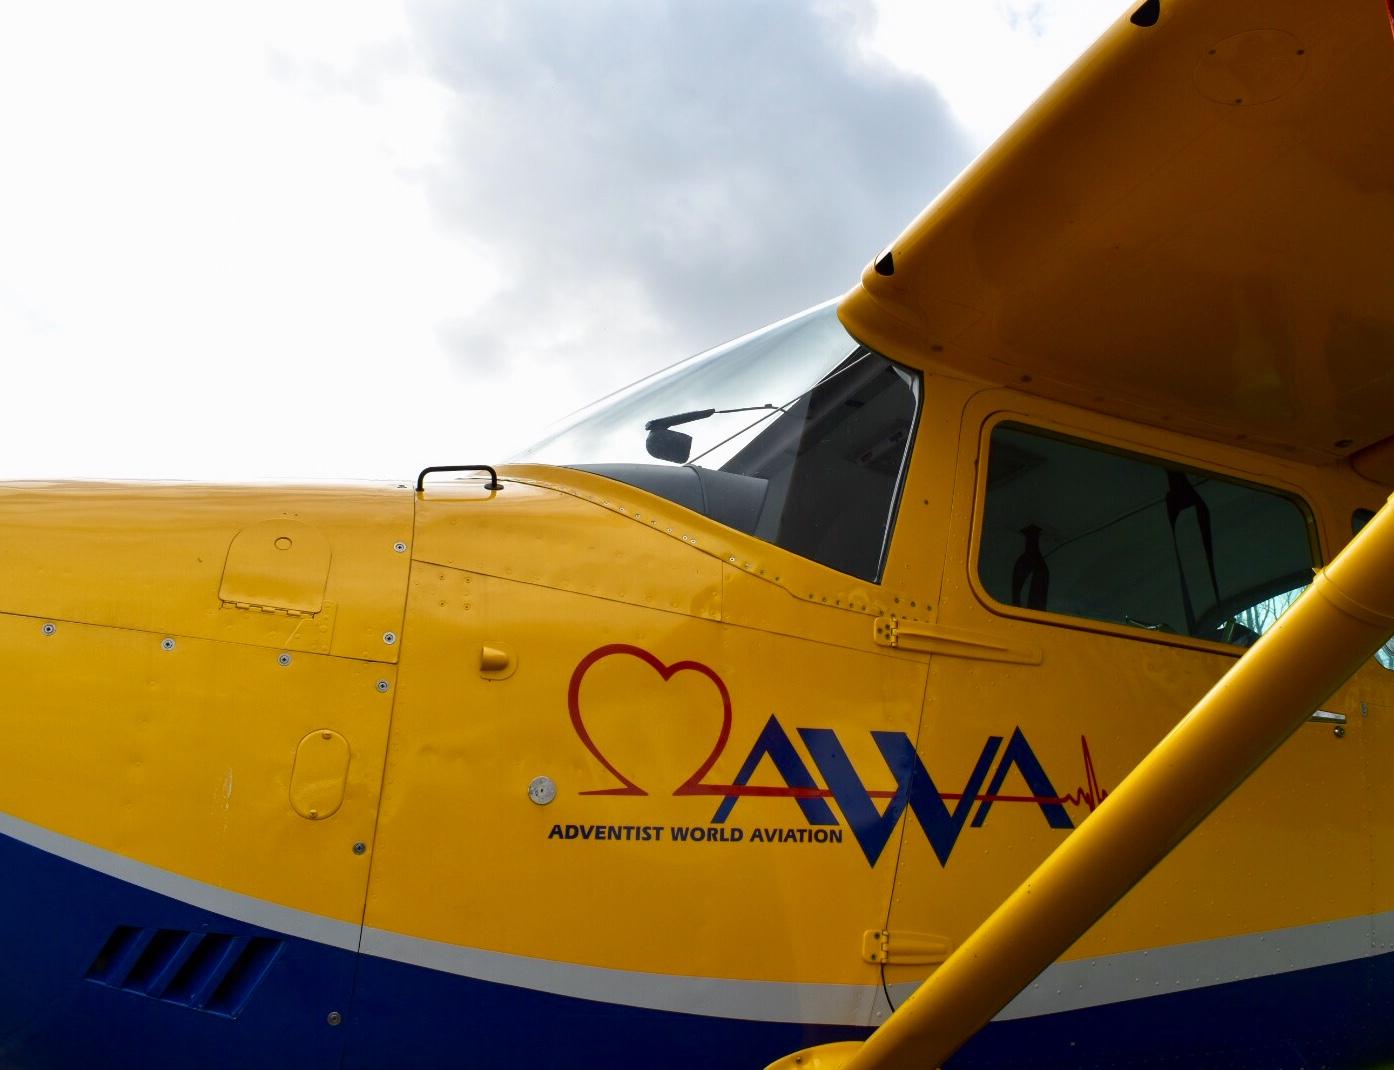 Cessna 182N – Pathfinder Plane – Adventist World Aviation